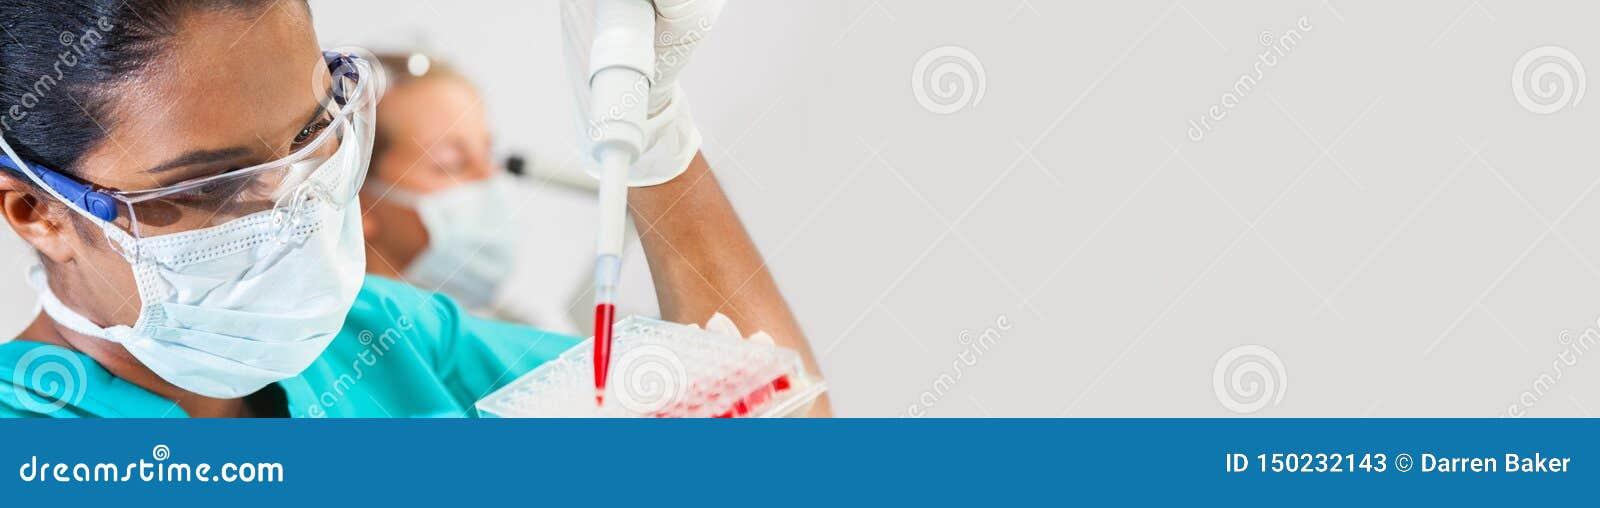 Científico de sexo femenino asiático Pipette Blood Sample en laboratorio de investigación médica